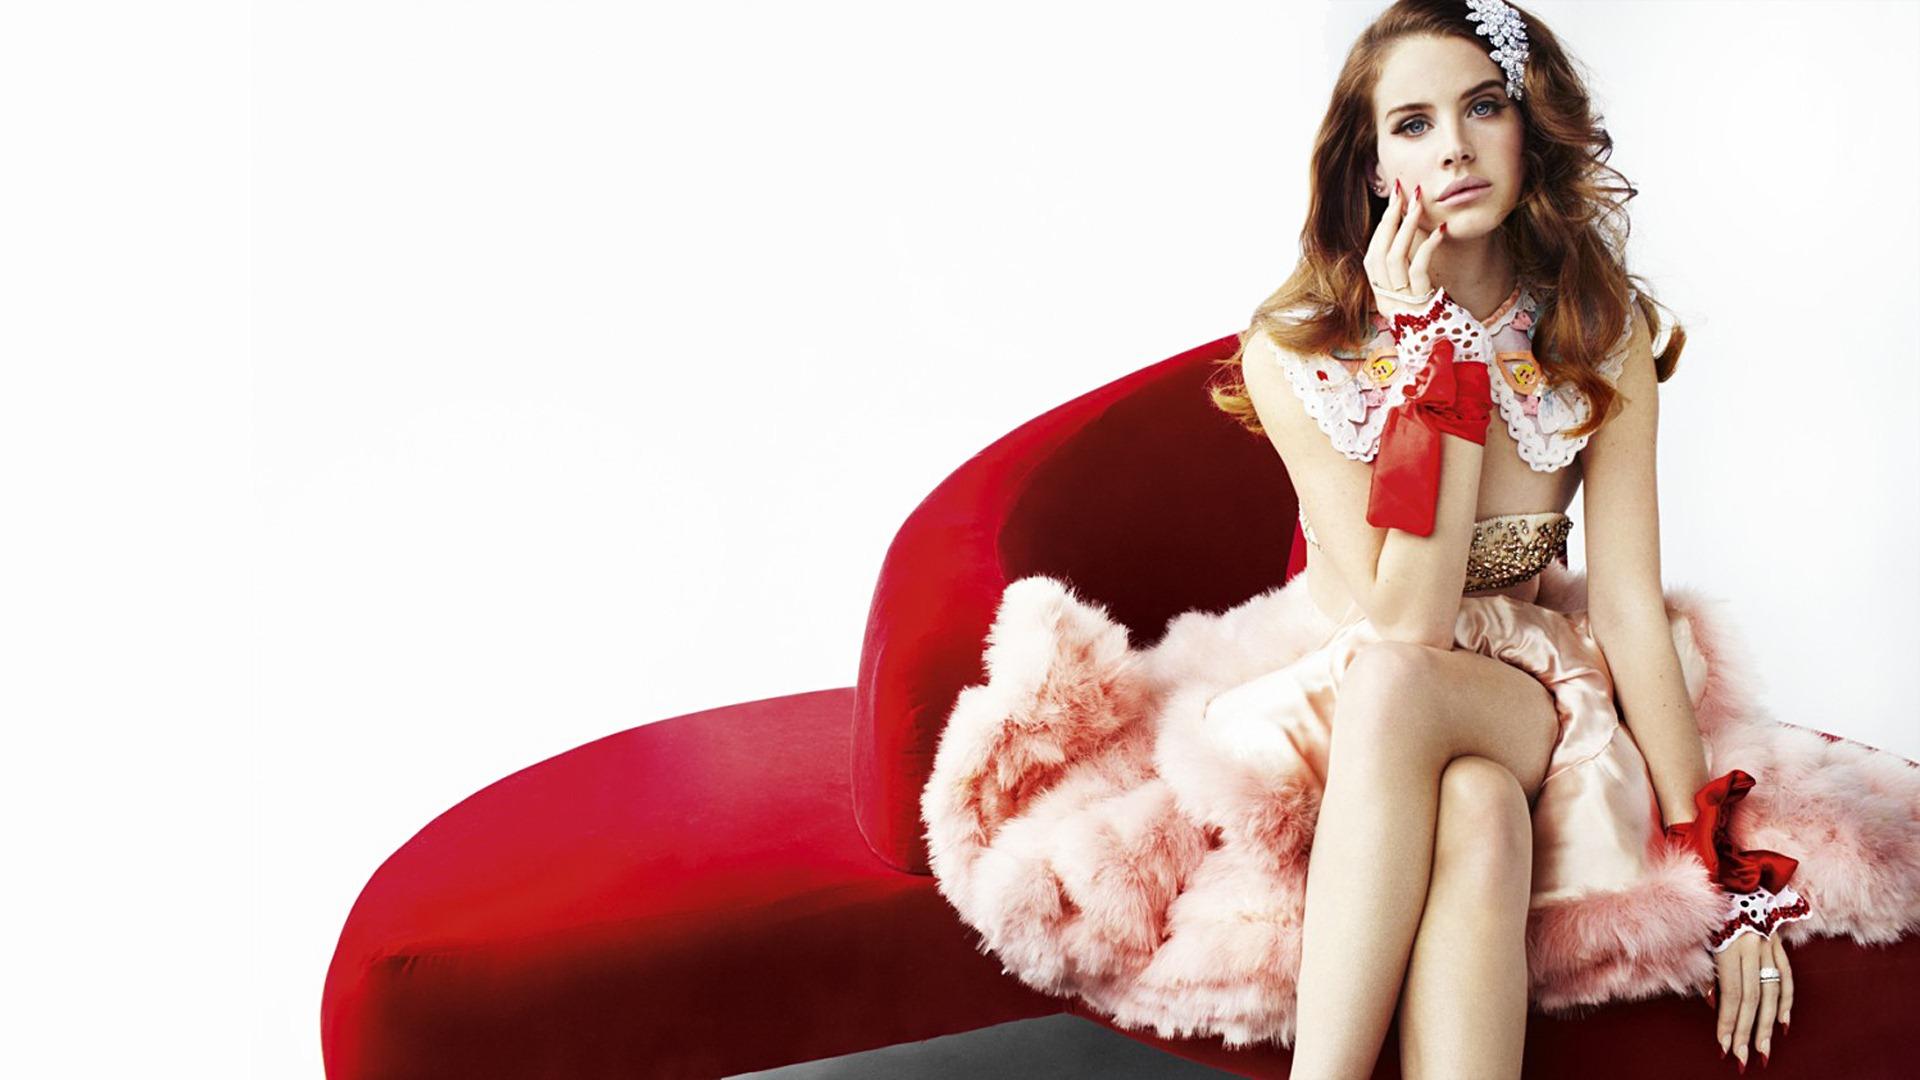 Pink Dress Wallpaper 35361 1920x1200 px